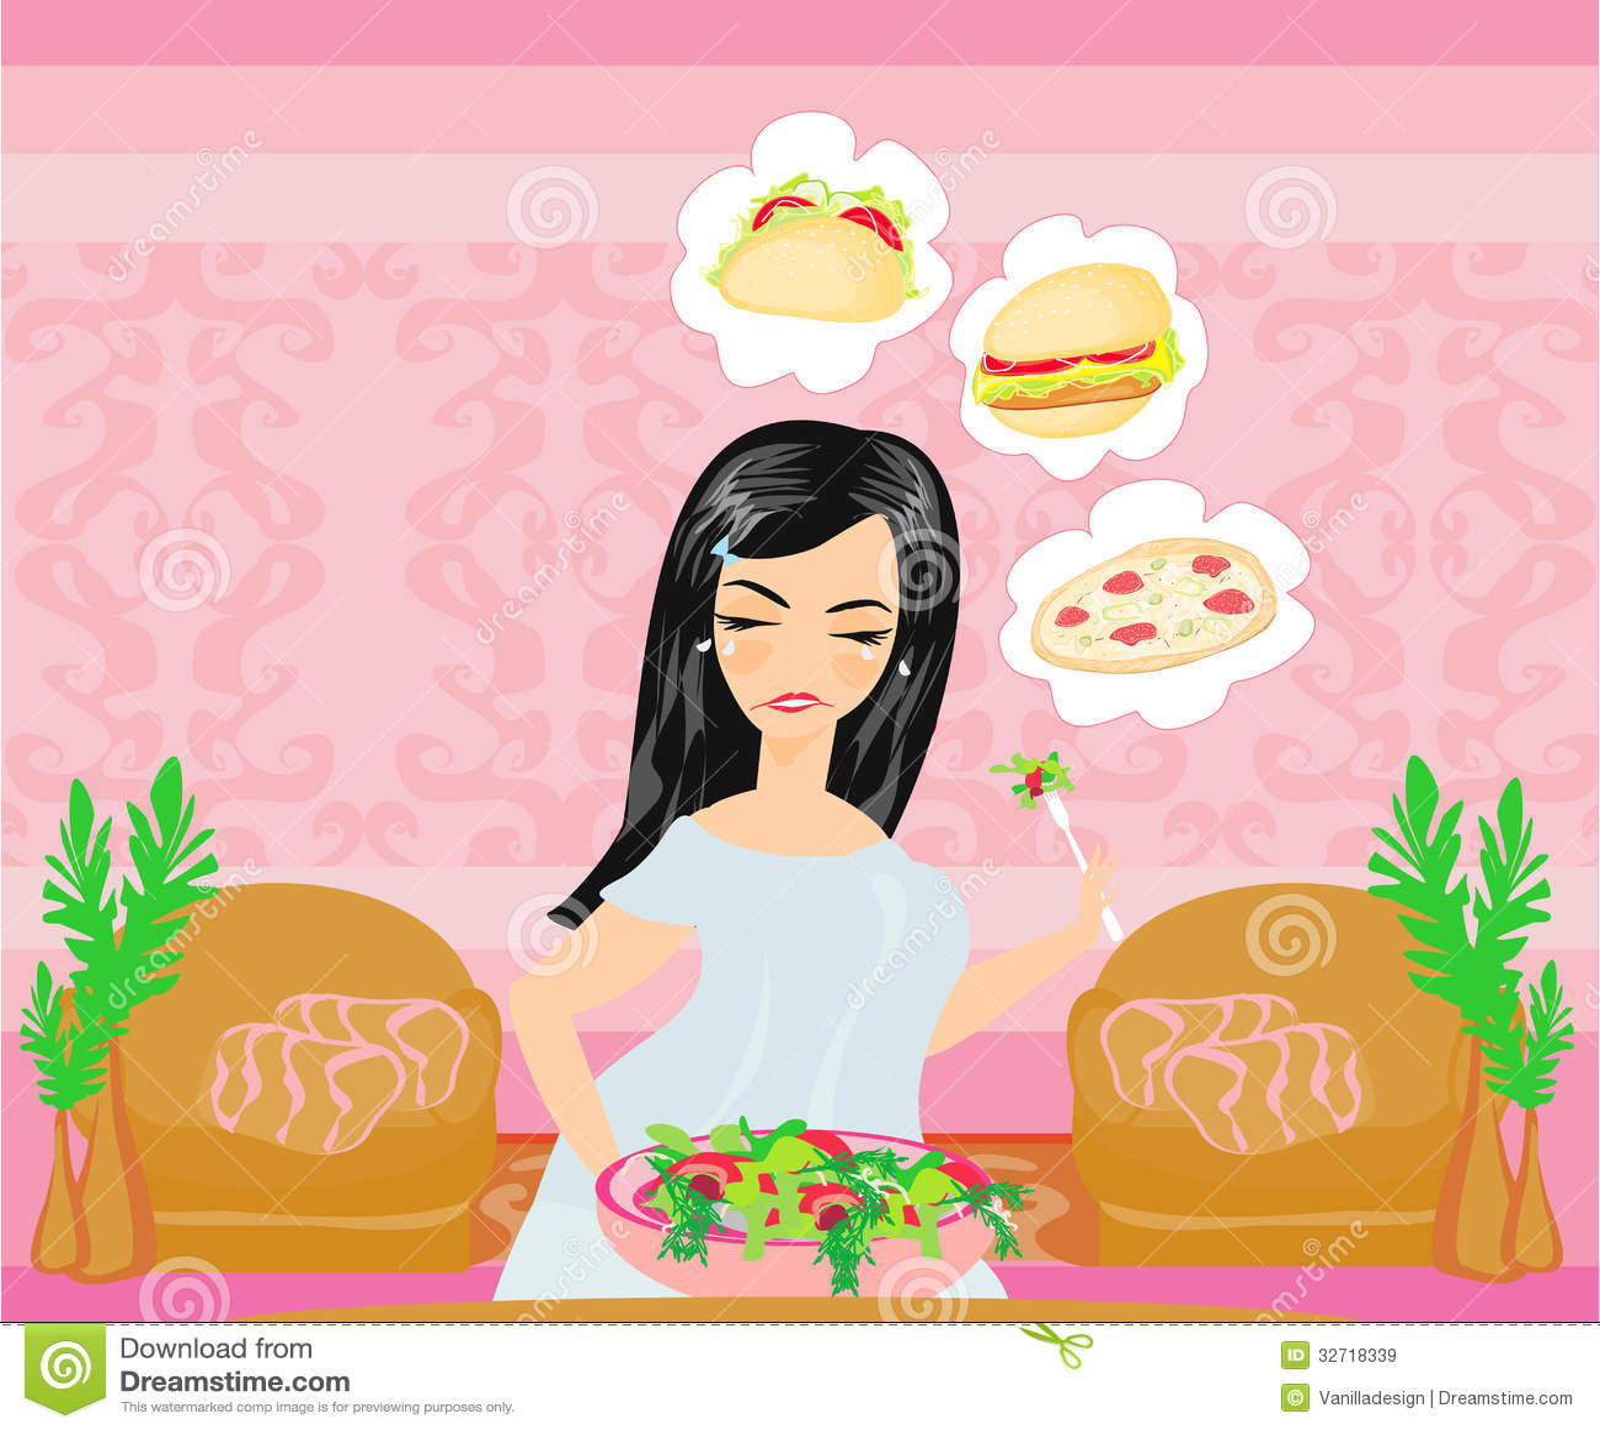 Полная девушка ест салат но мечты еды фаст-фуда